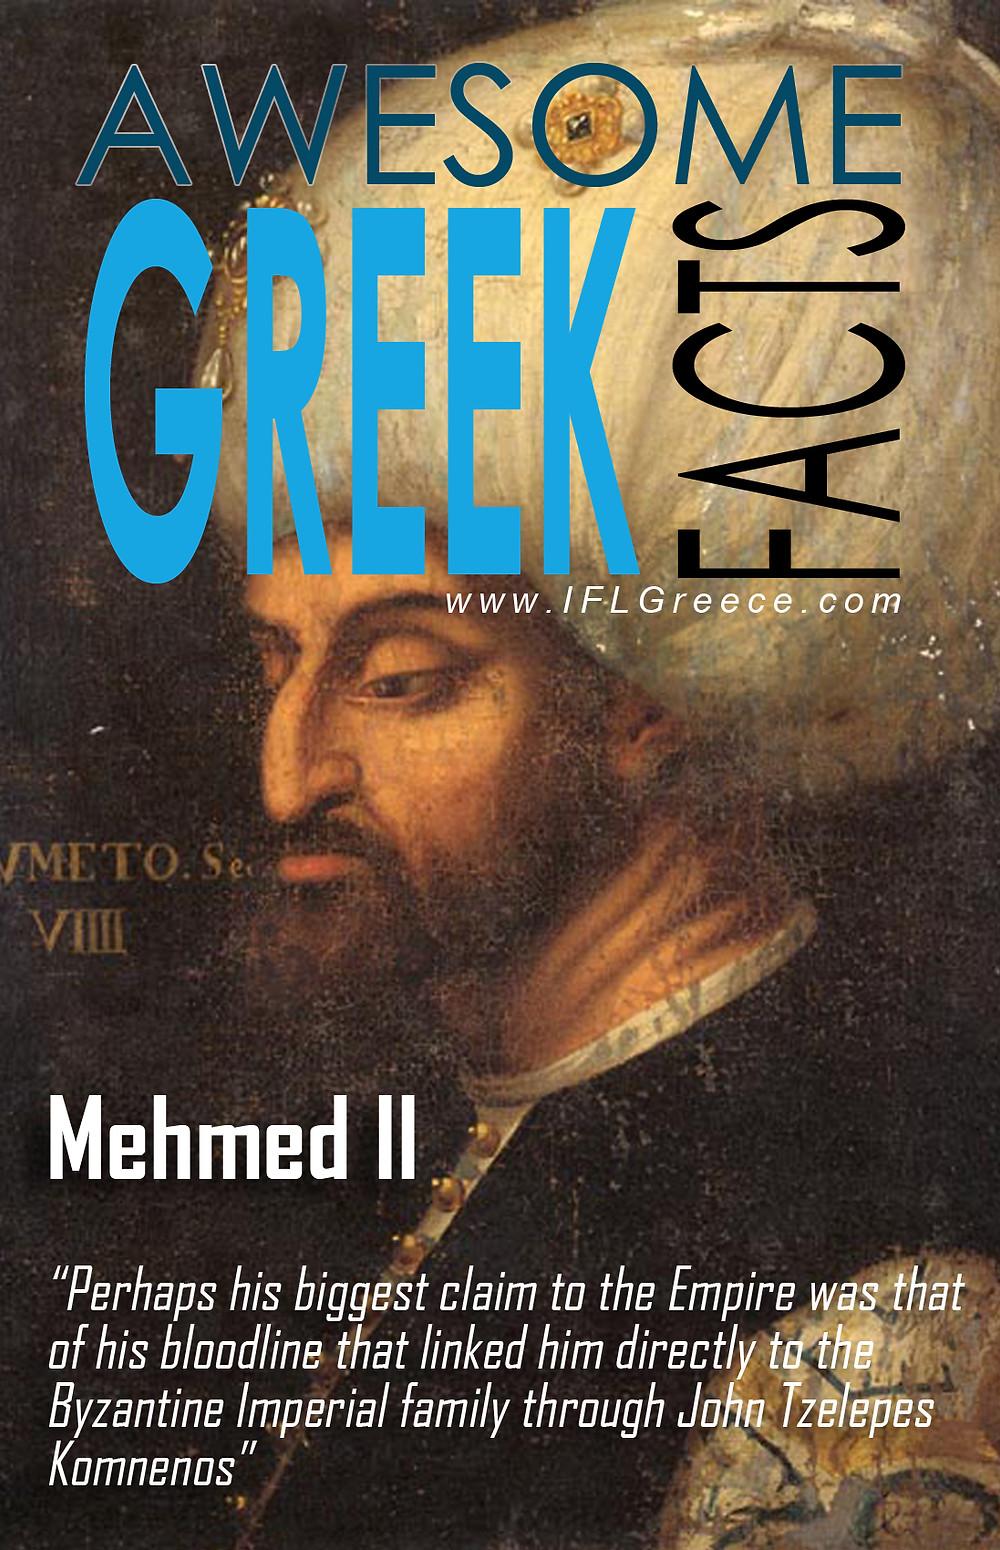 The Greekness of the Ottoman Turks